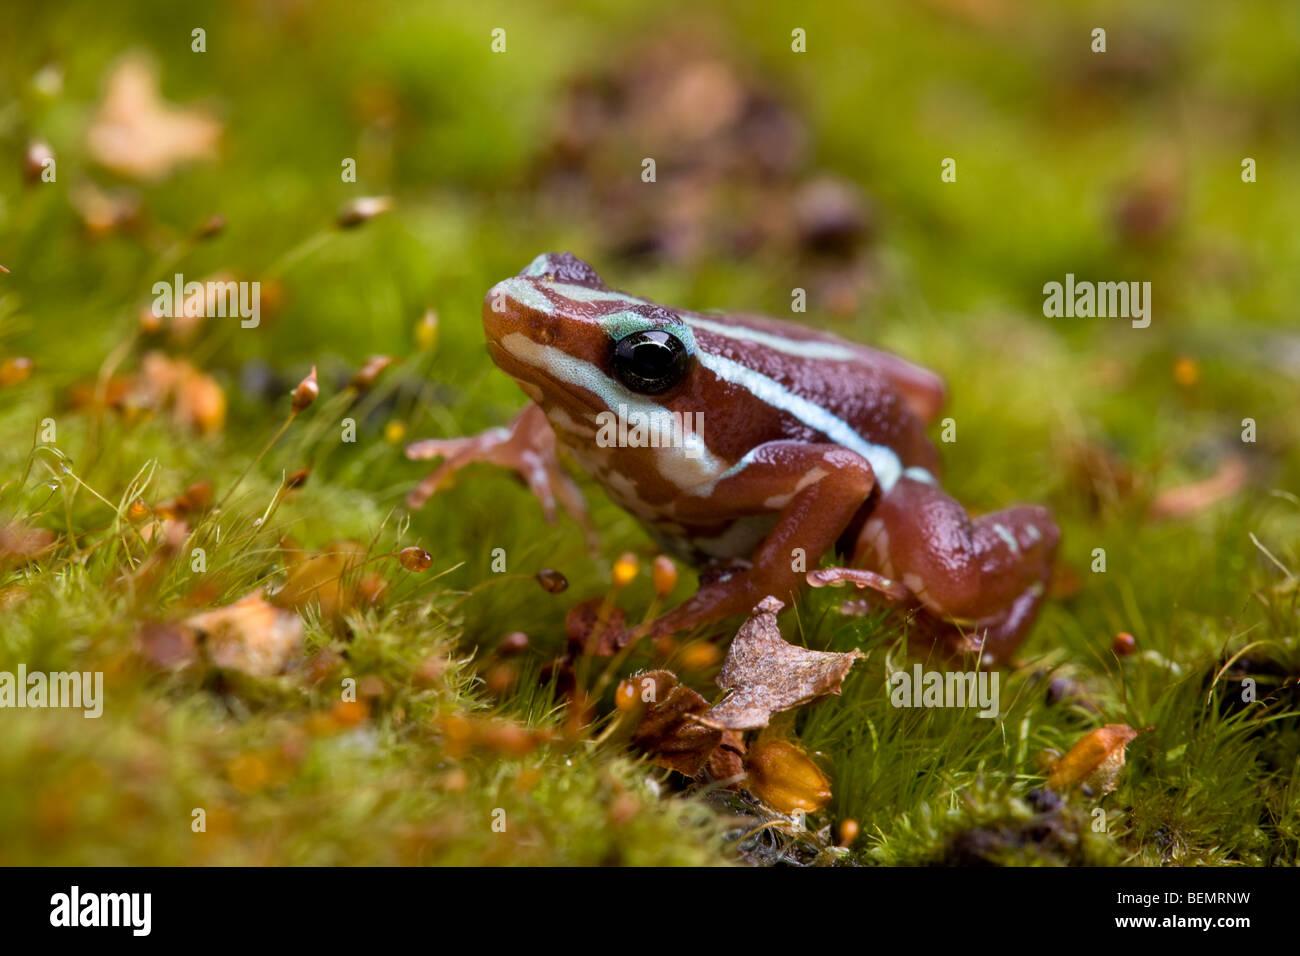 Phantasmal Poison Dart Frog, Epipedobates tricolor - Stock Image